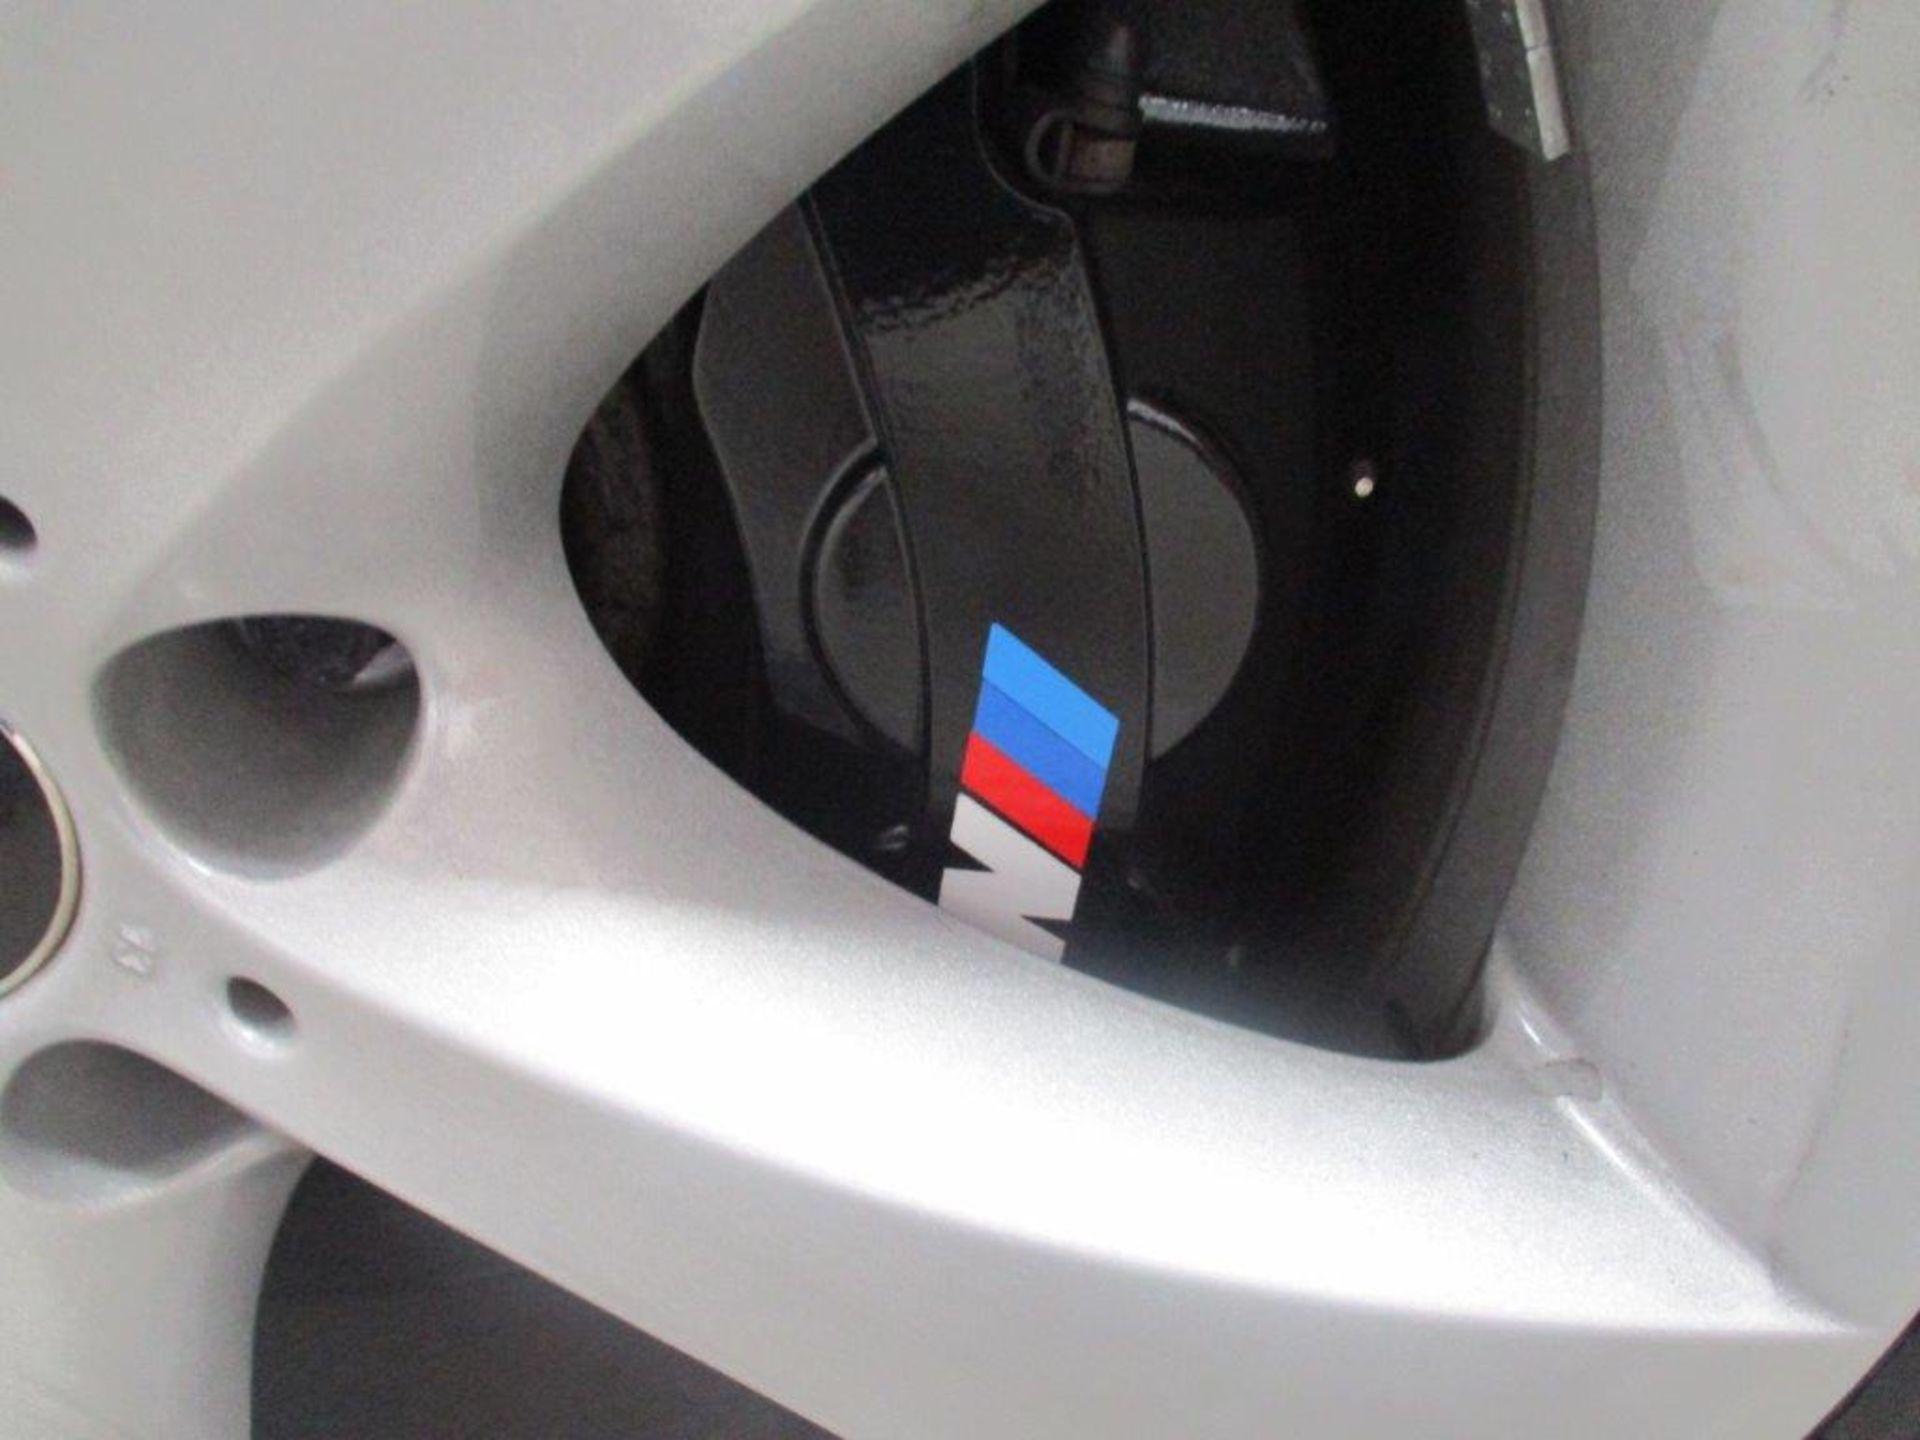 60 10 BMW X5 M Turbo Auto - Image 9 of 35